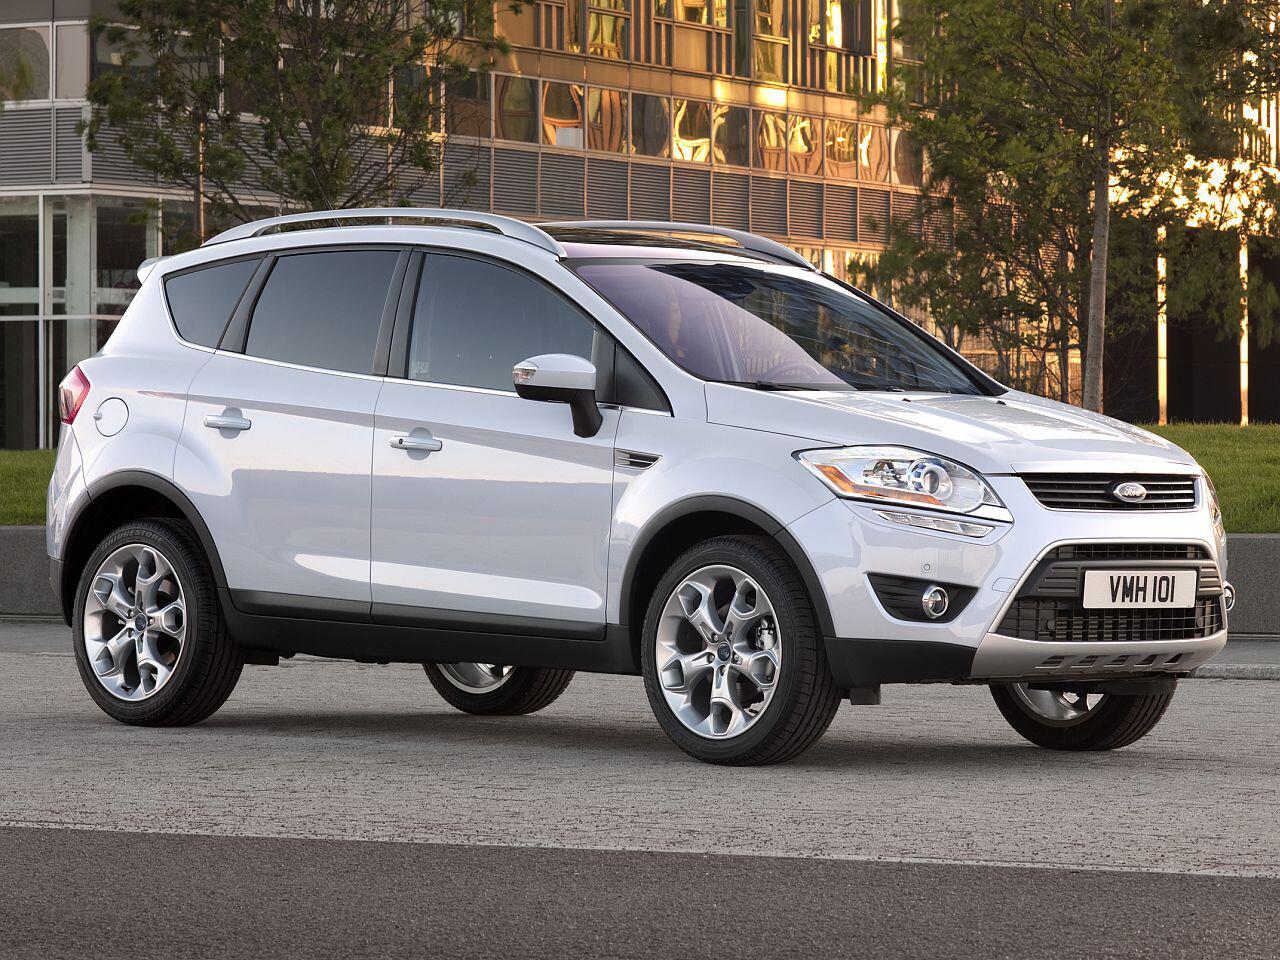 Bild zu 3. Platz: Ford Kuga